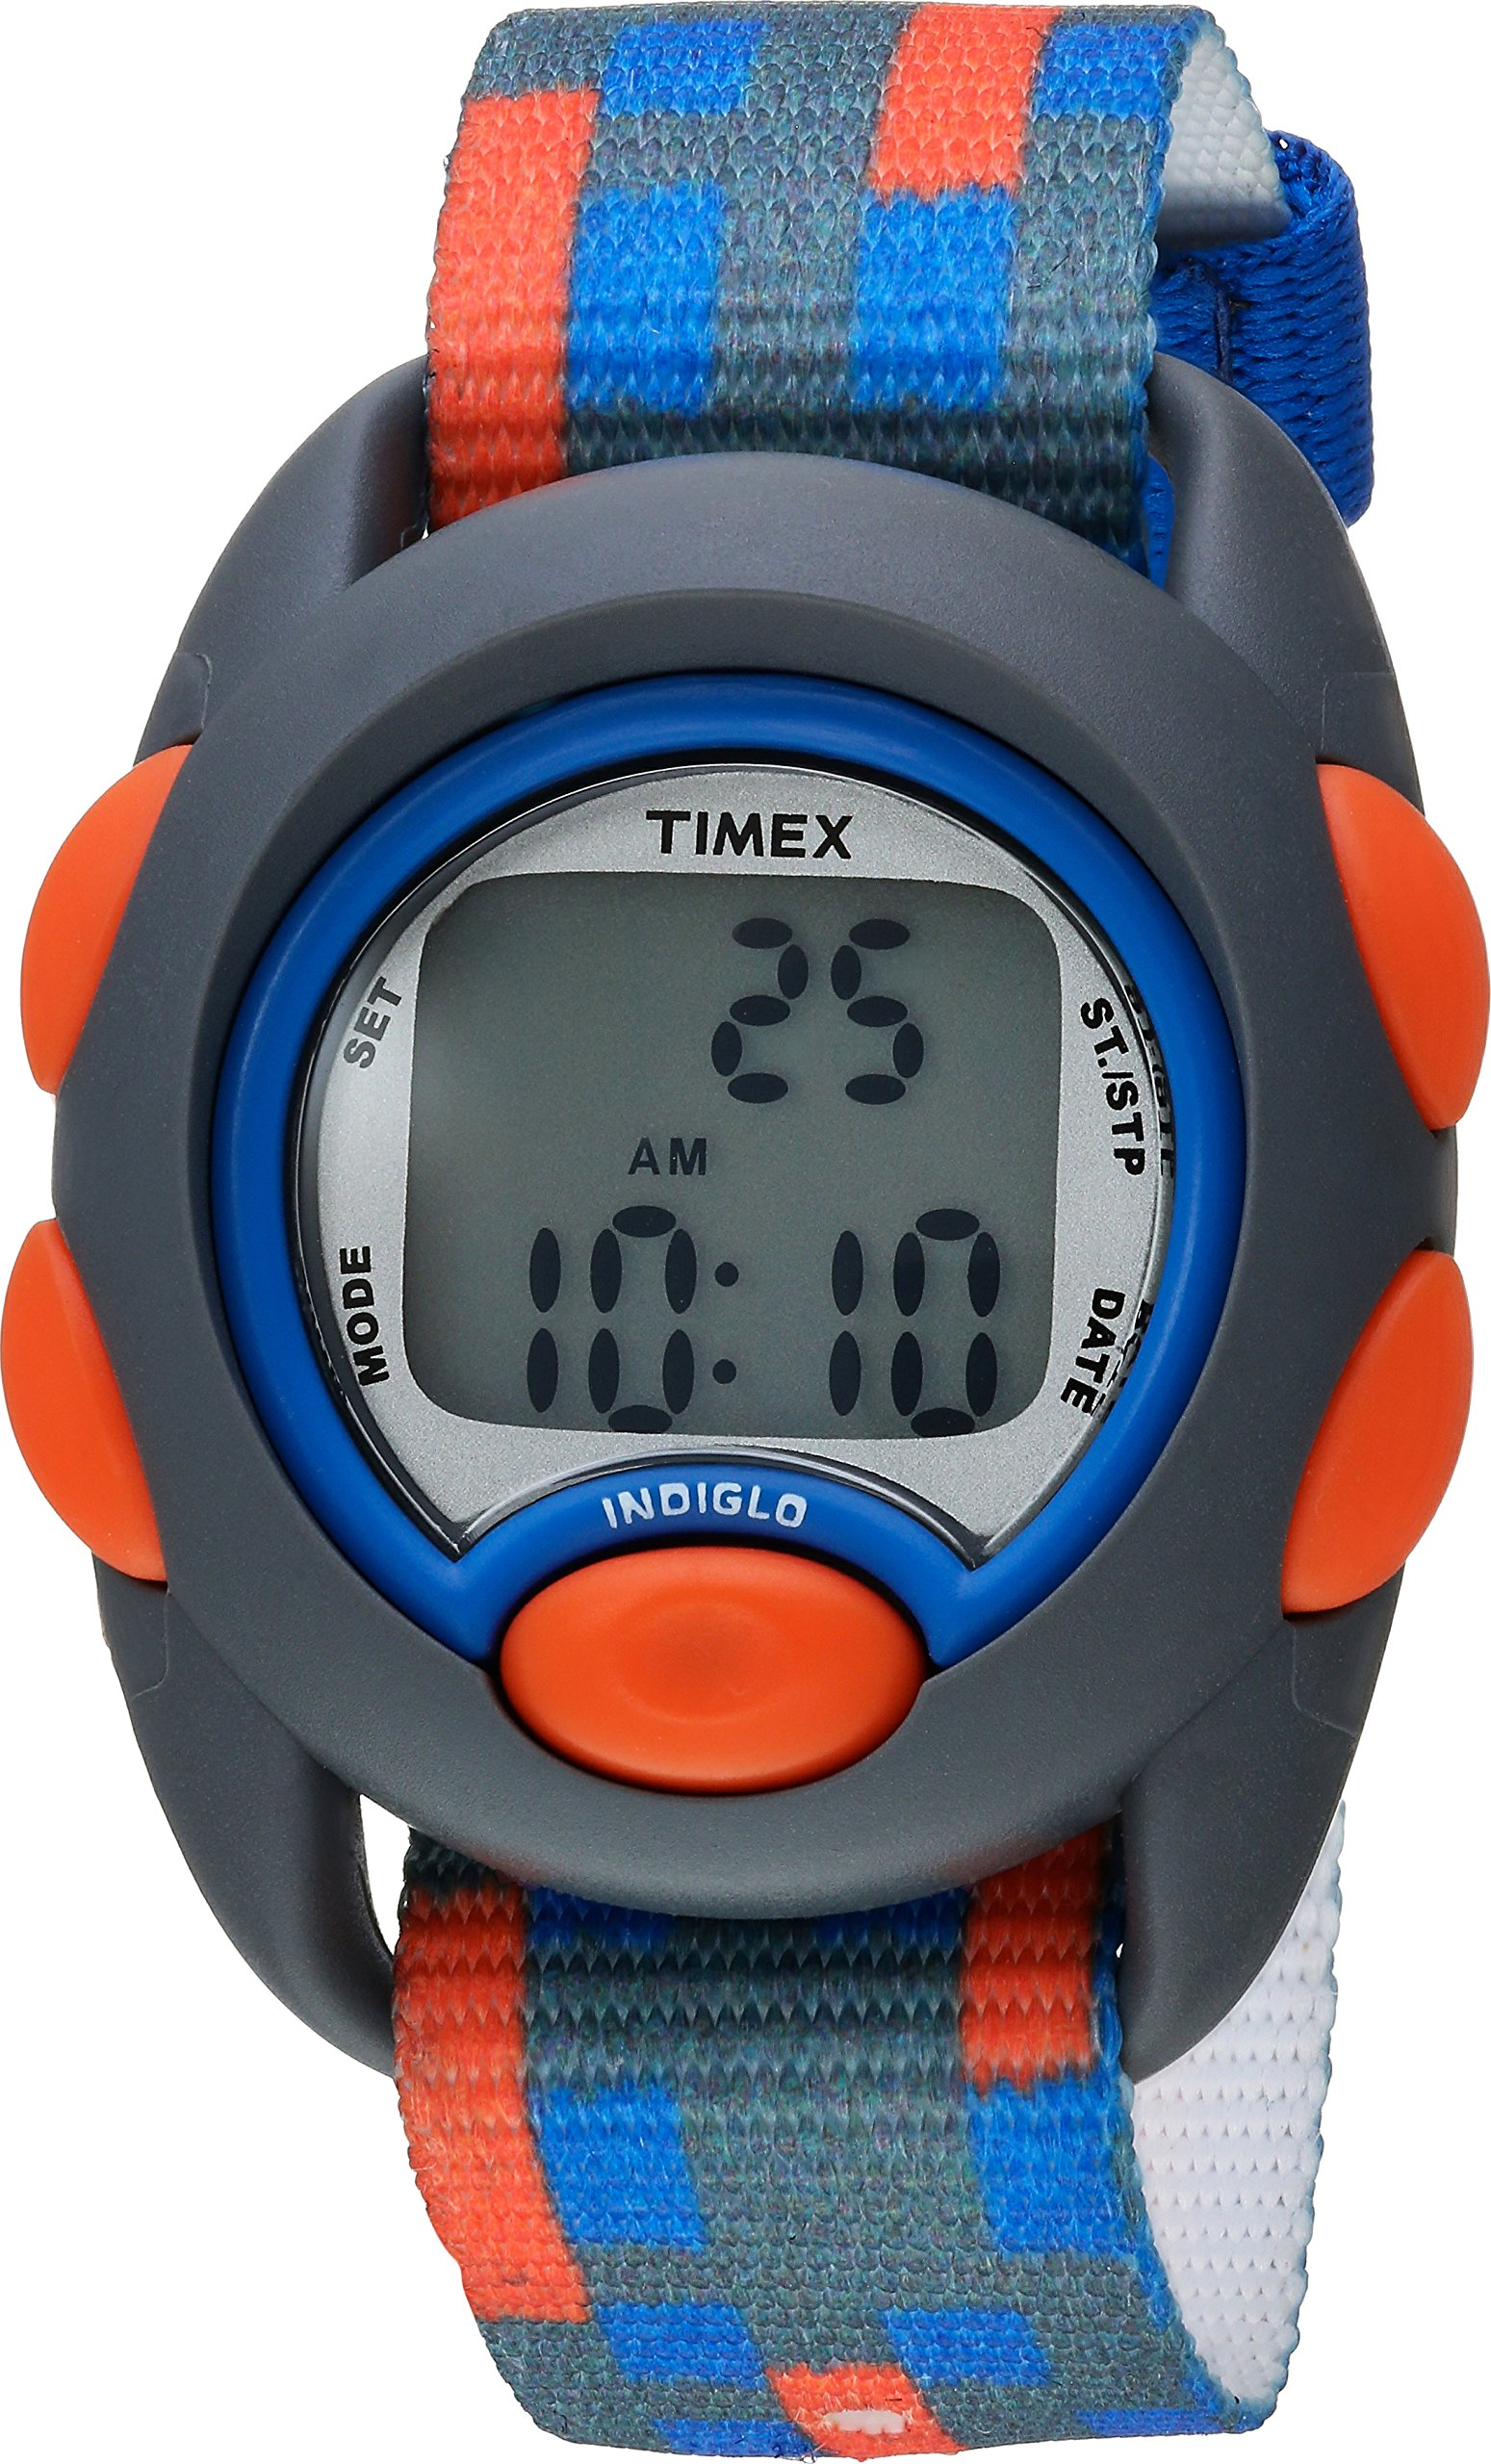 Timex Boys TW7C12900 Time Machines Digital Gray/Blue/Red Fabric Strap Watch by Timex